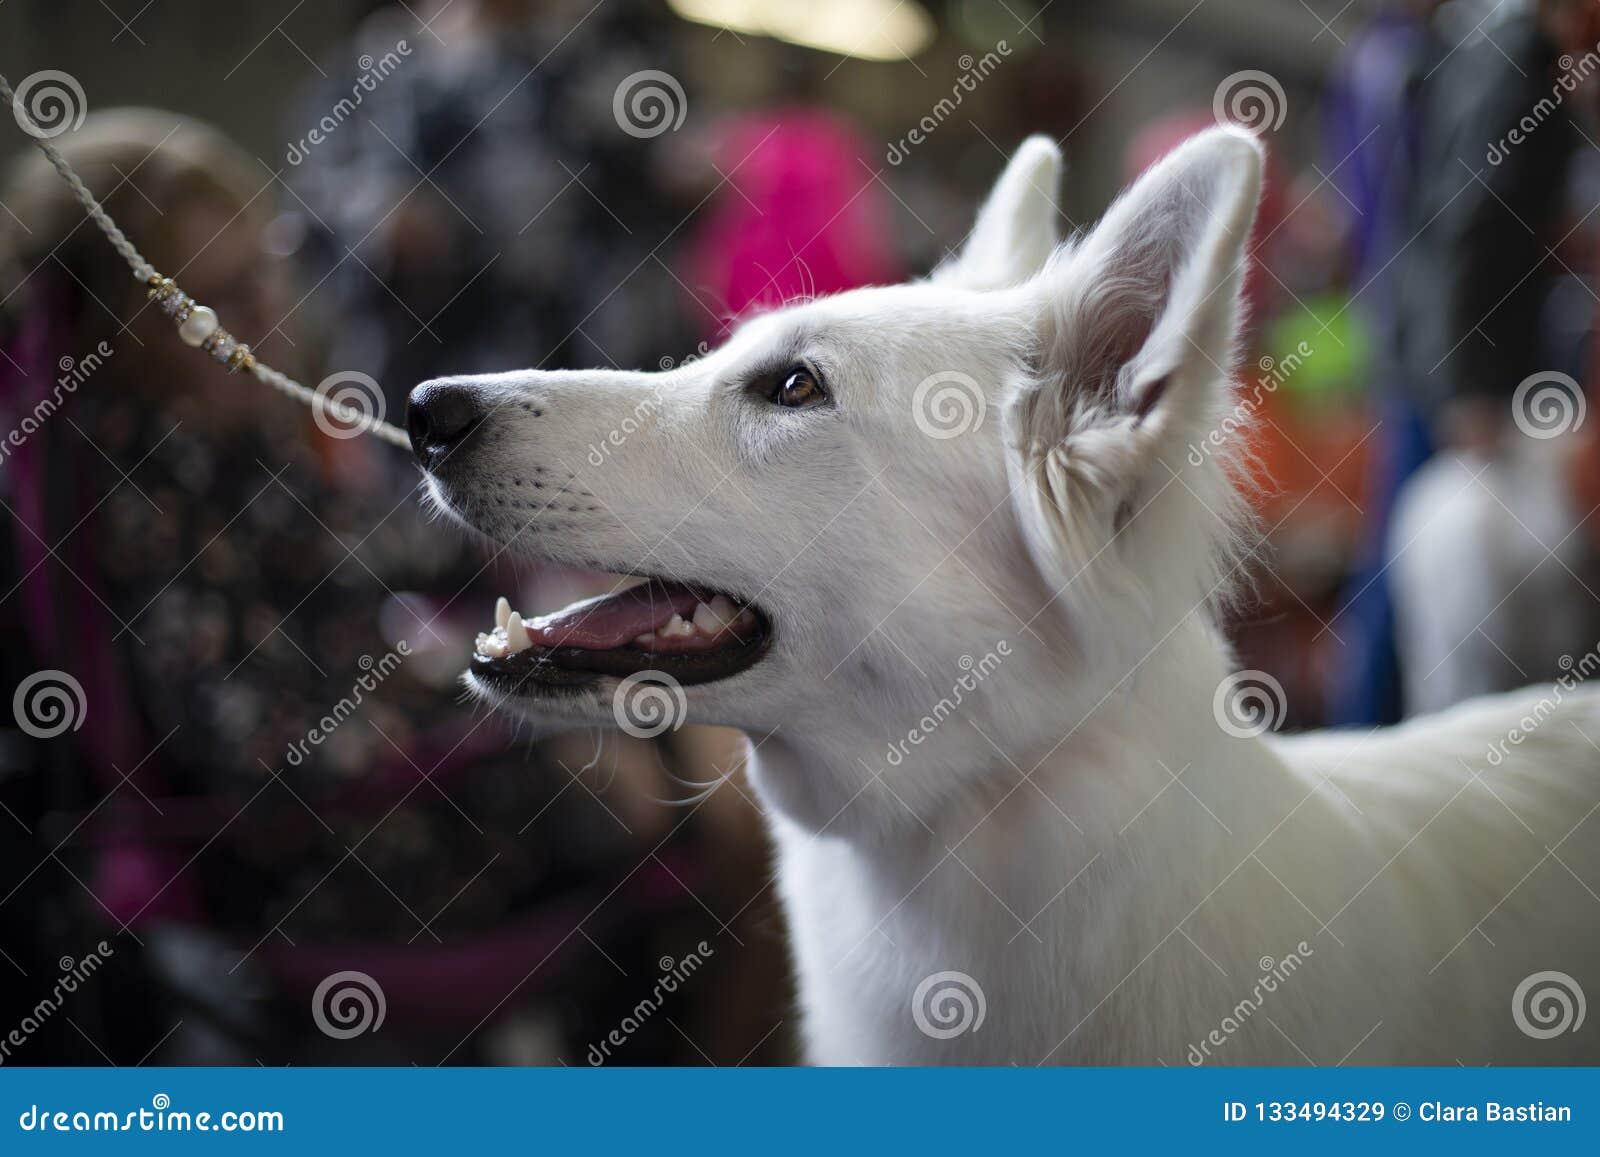 White shepherd breed on a leash.